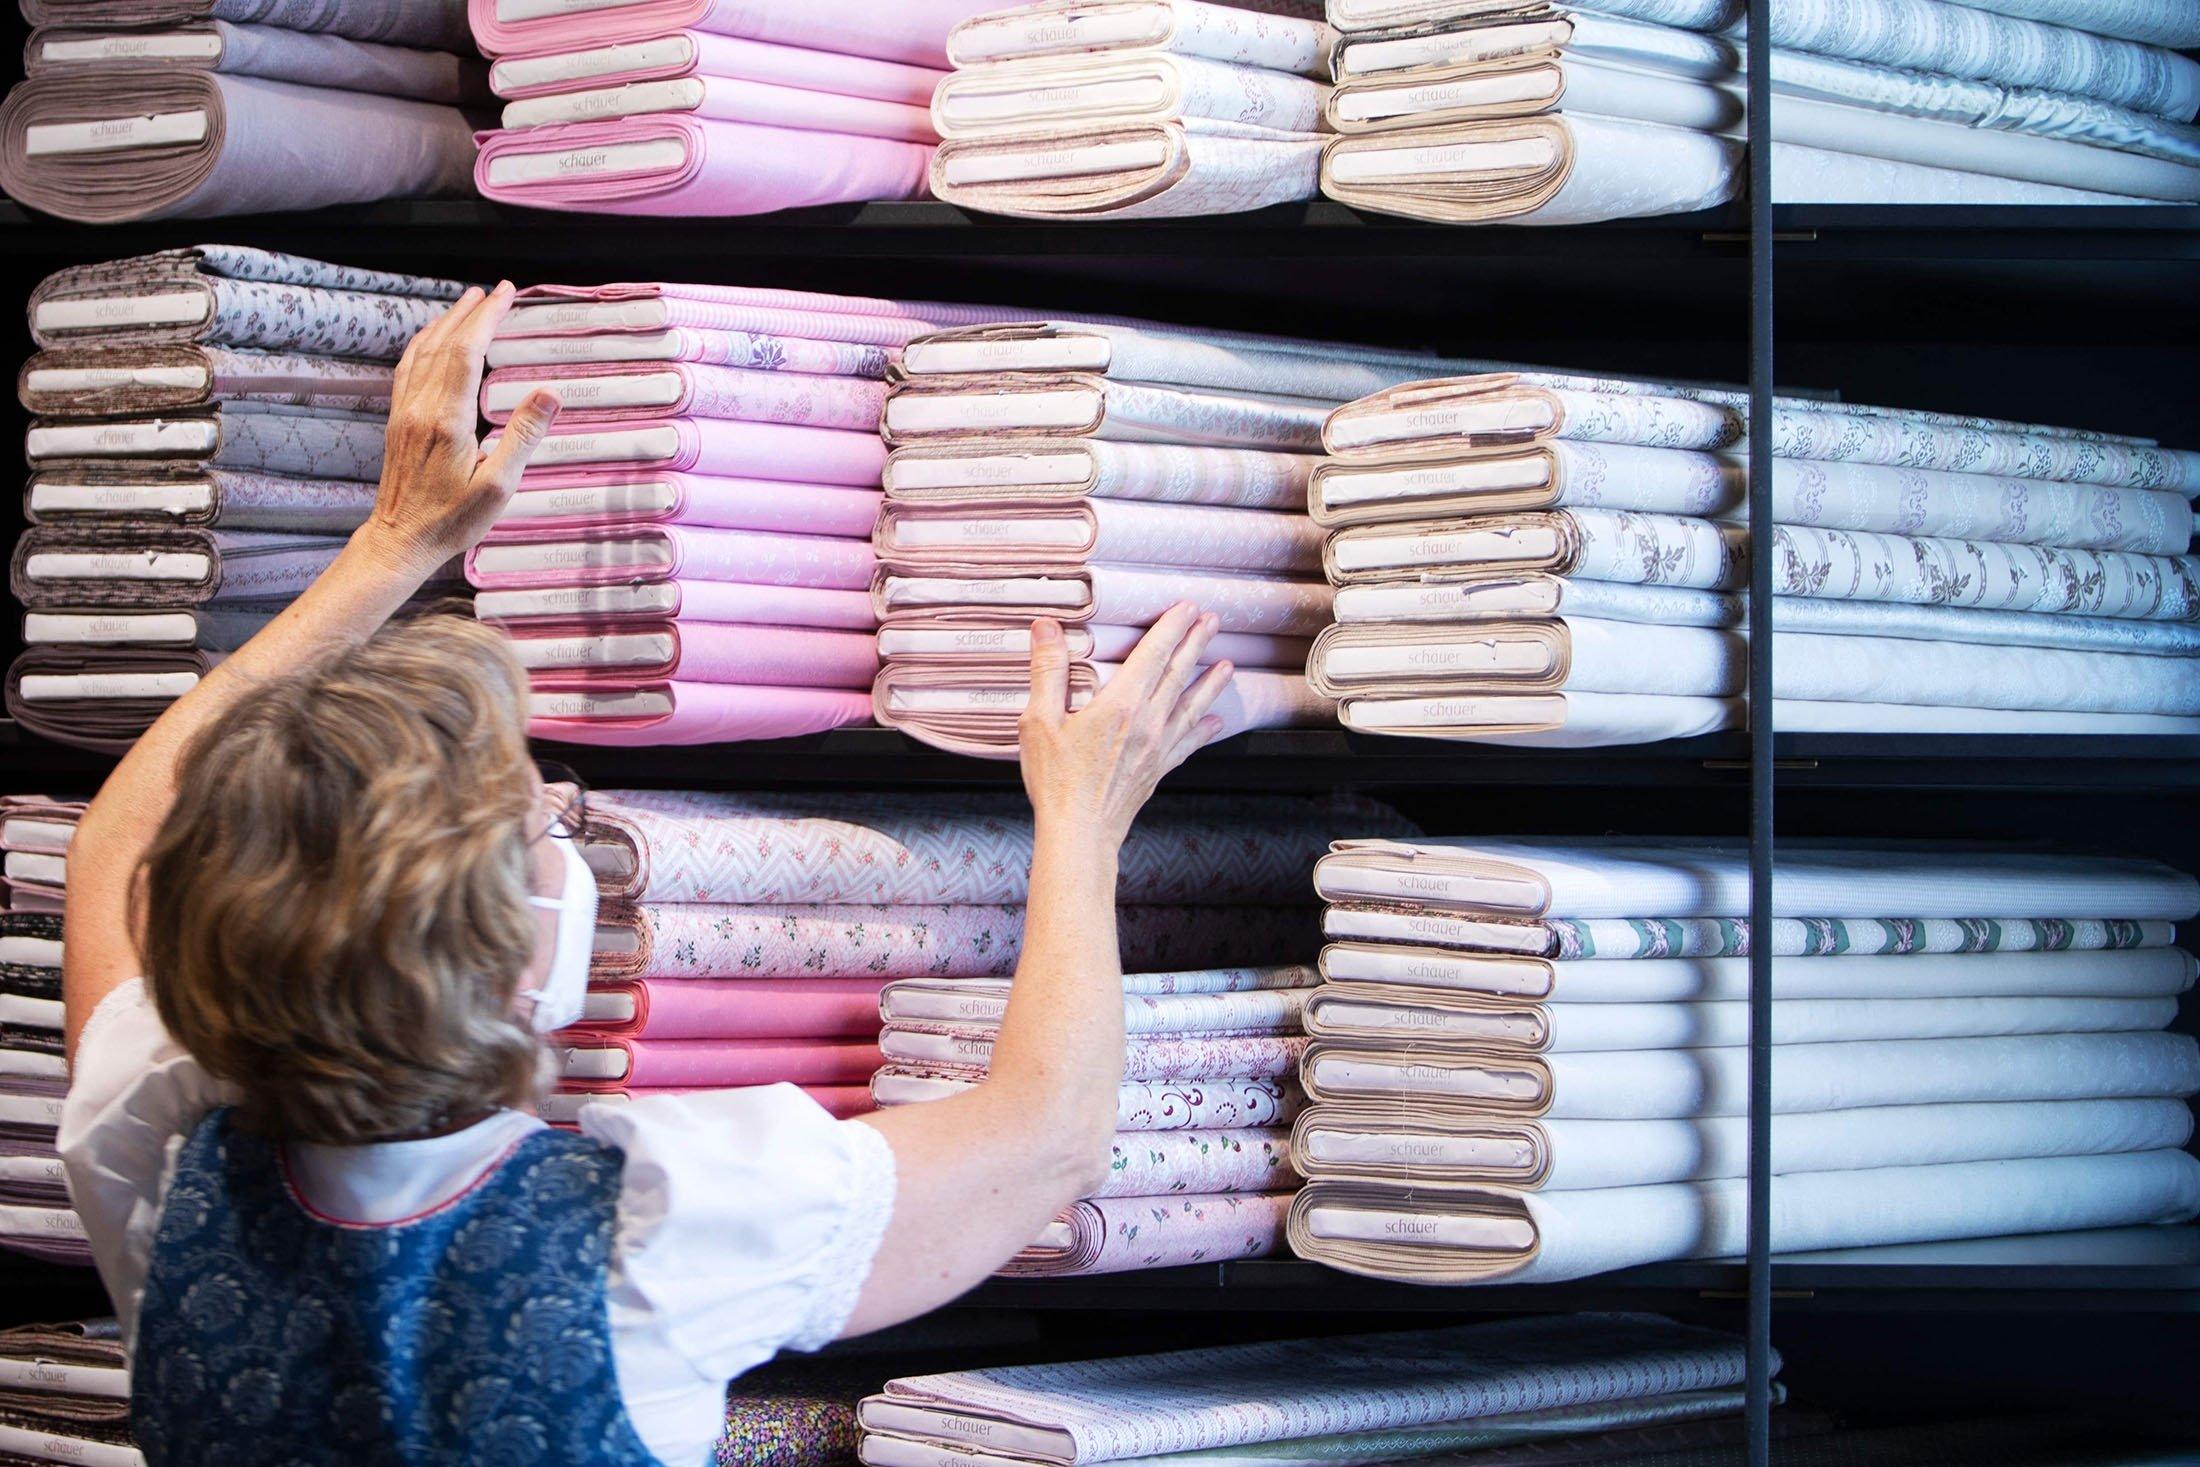 An employee arranges the fabrics at the Schauer Atelier dirndl shop in Bad Ischl, Upper Austria, June 24, 2021. (AFP Photo)